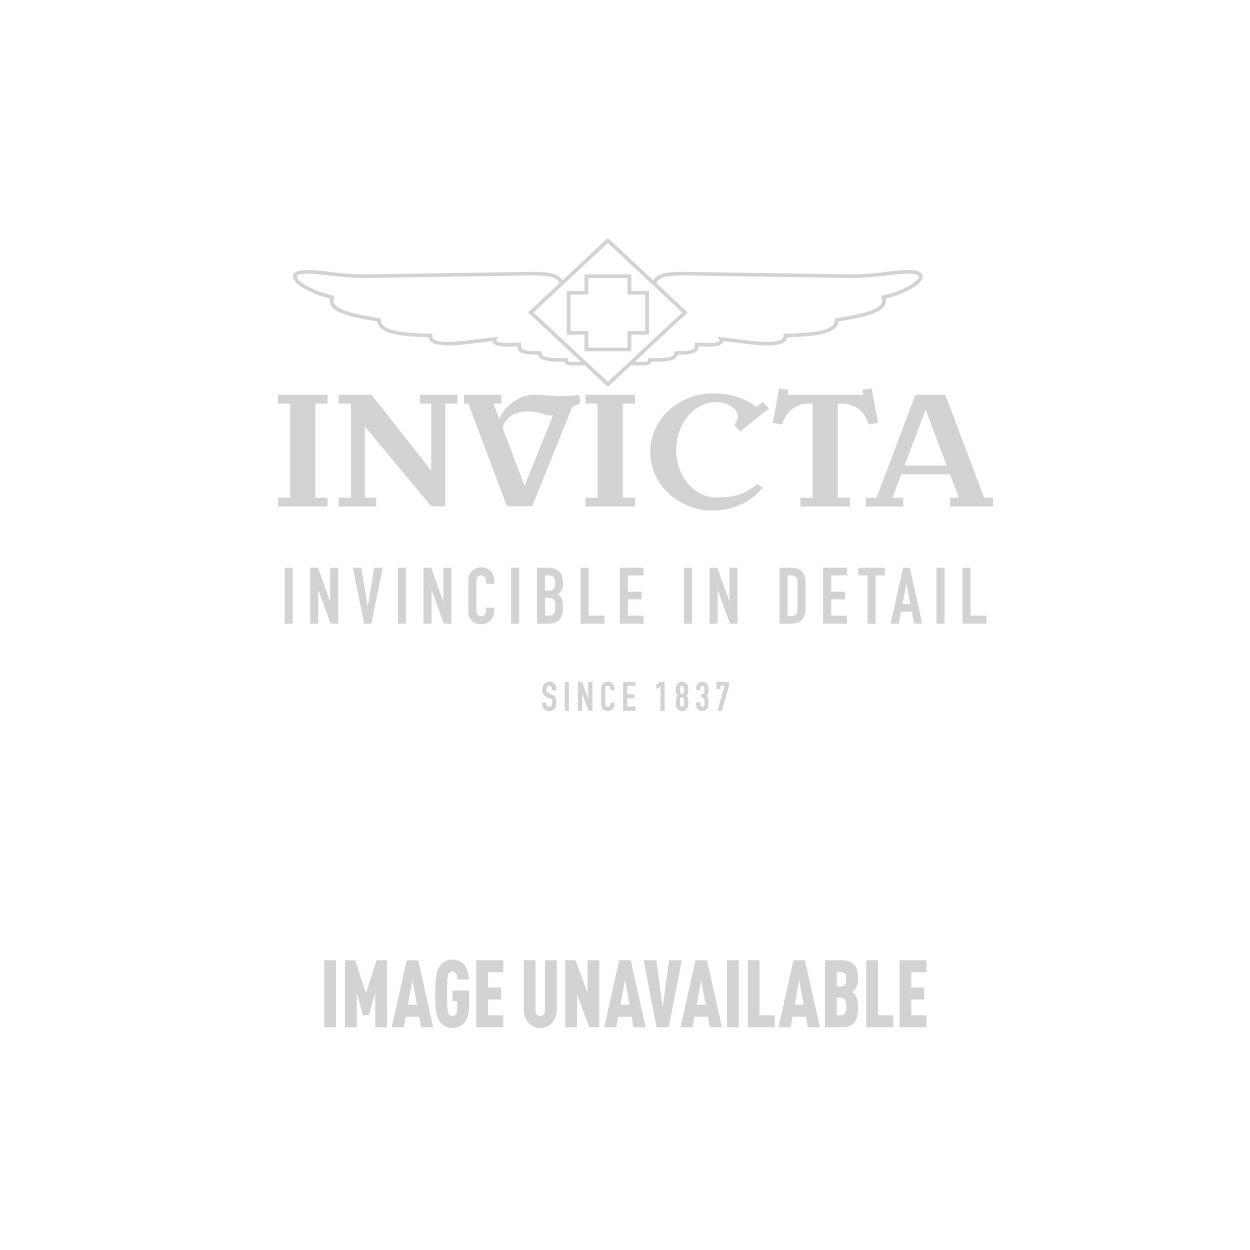 INVICTA Jewelry AISHA Rings None 13 Silver 925 and Enamel Rhodium+Brown+Pearl White - Model J0110